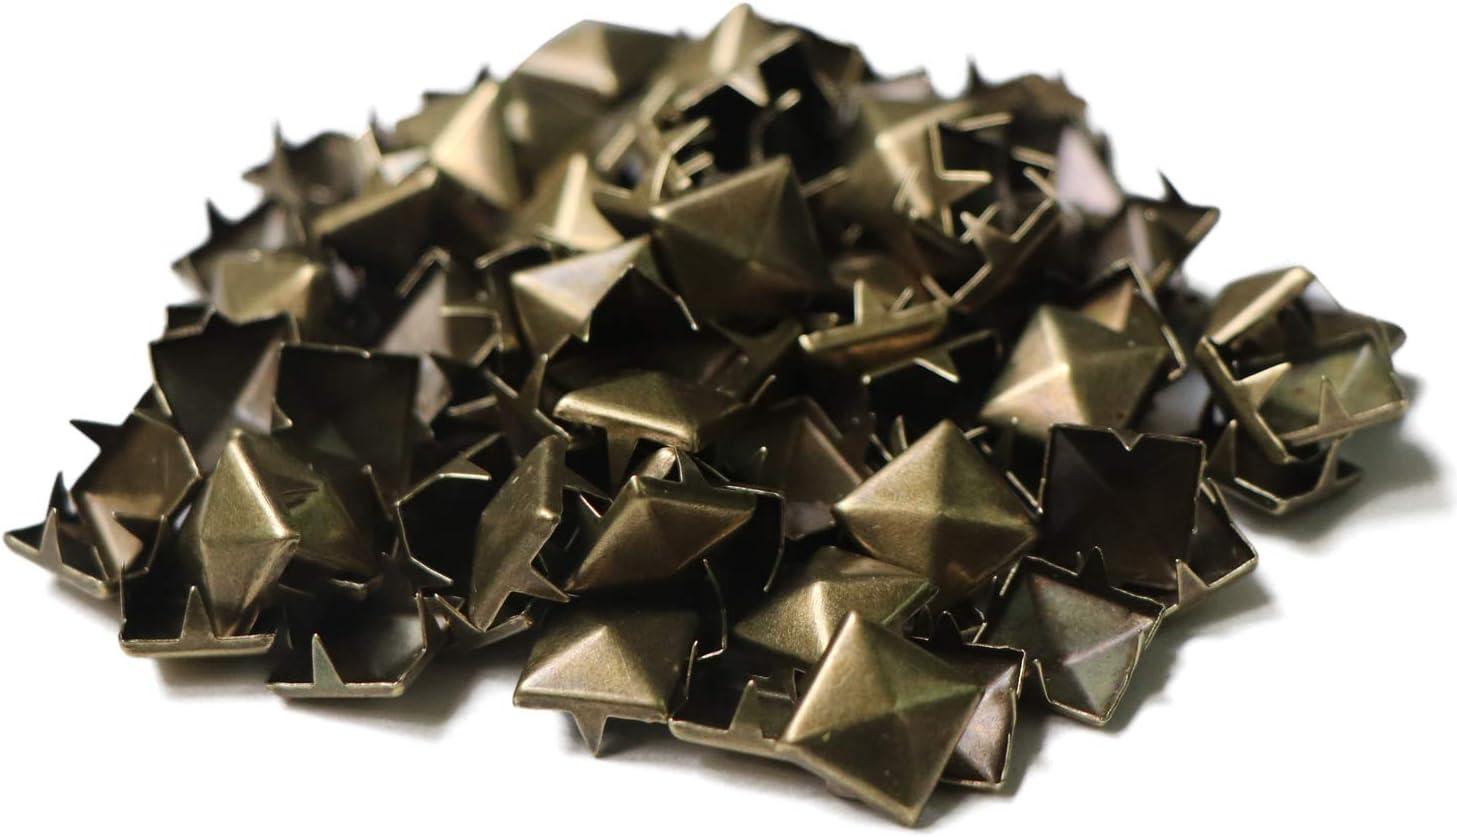 SPWOLFRT Great interest 100PCS 10mm Pyramid Shaped Studs Max 82% OFF Punk DIY Square Rivet